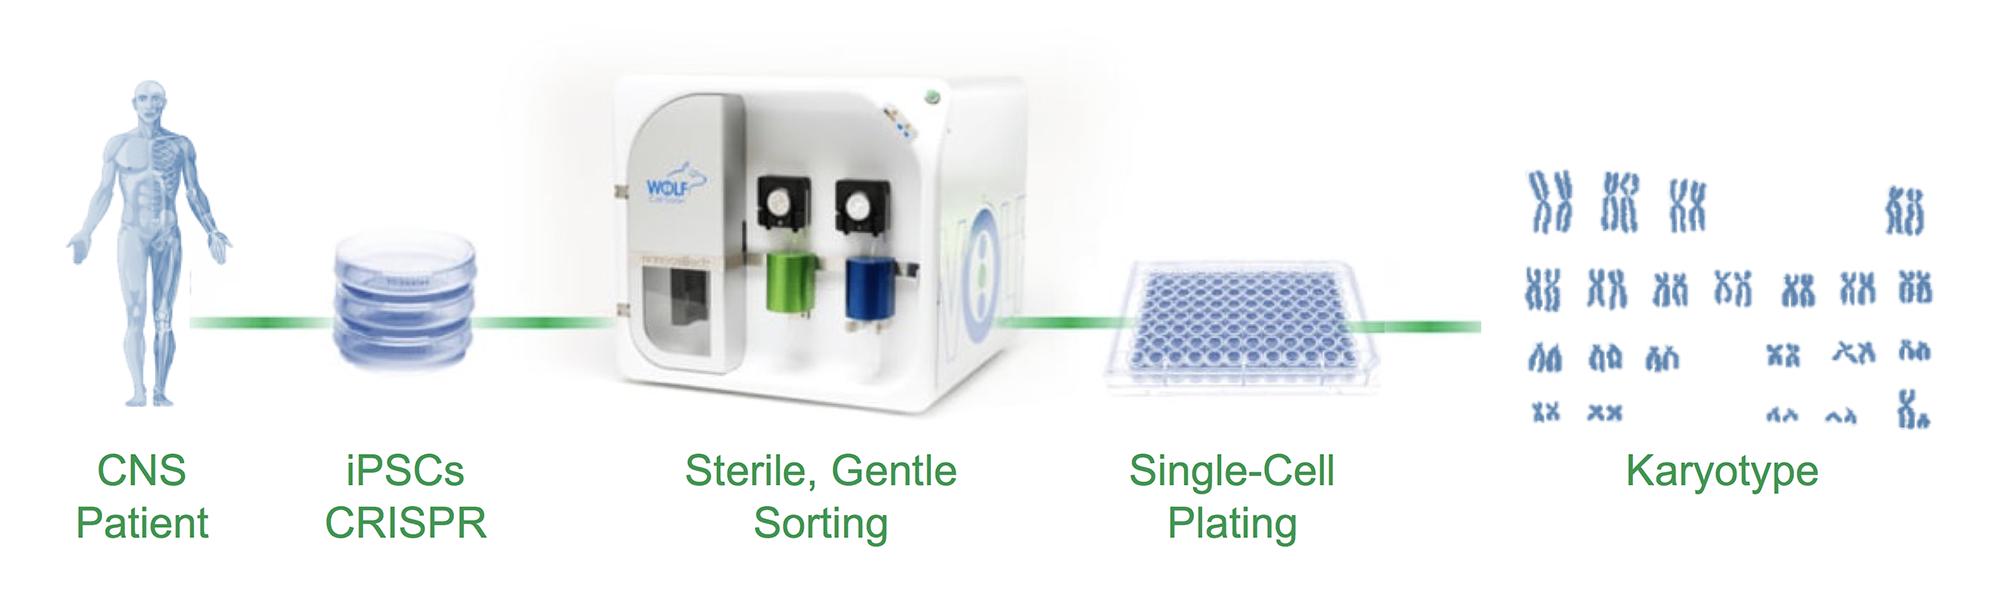 gene editing workflow